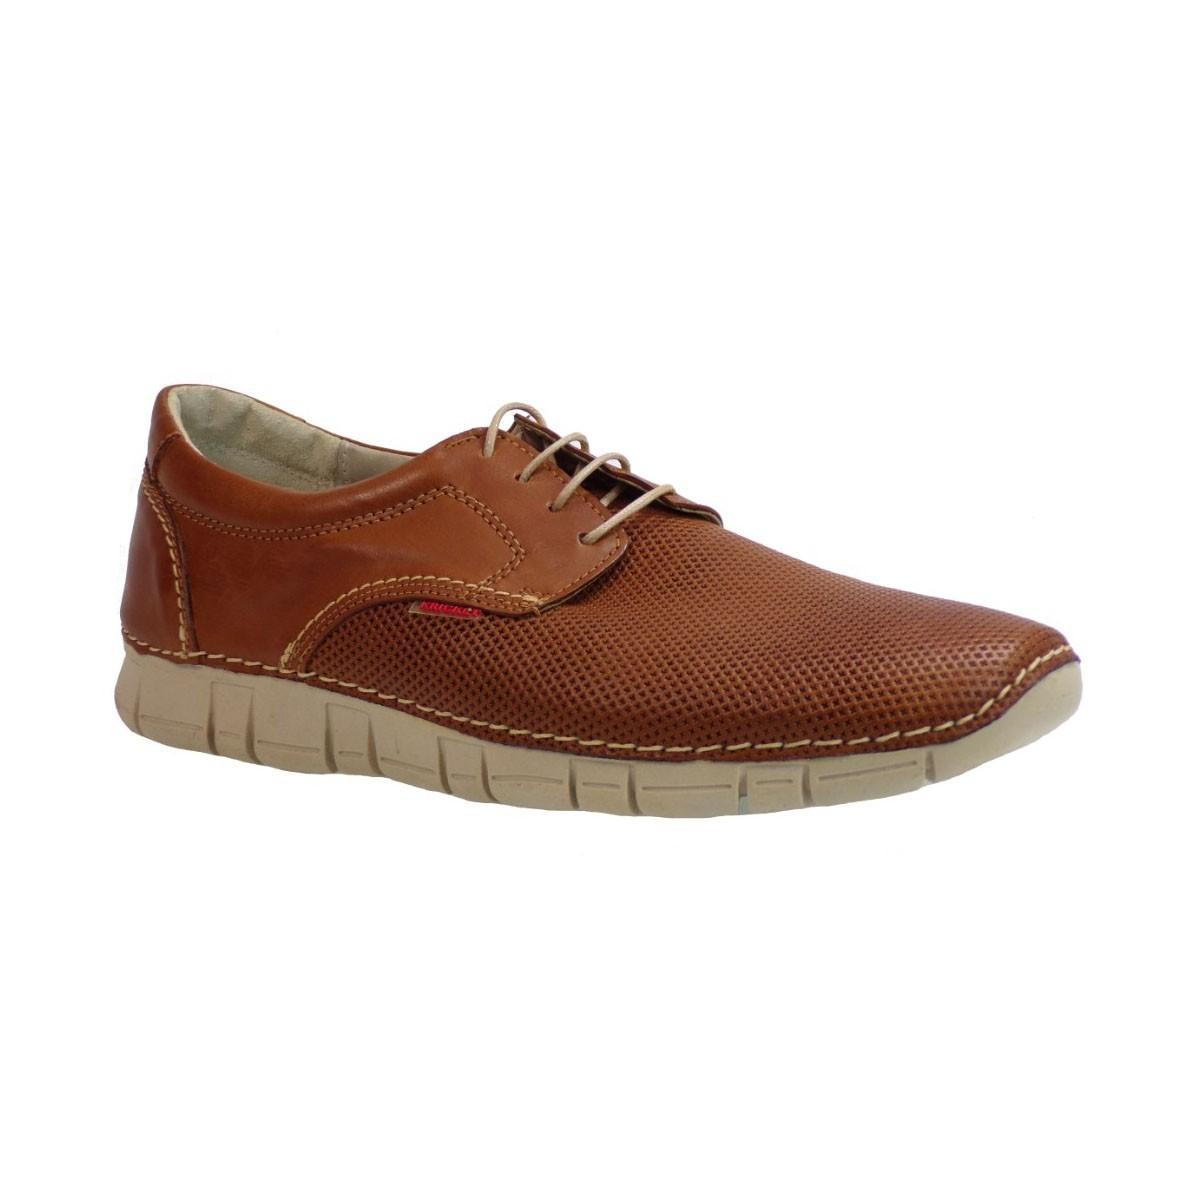 kricket Ανδρικά Παπούτσια FTELIA Ταμπά Τρυπητο Kricket Ftelia Ταμπά